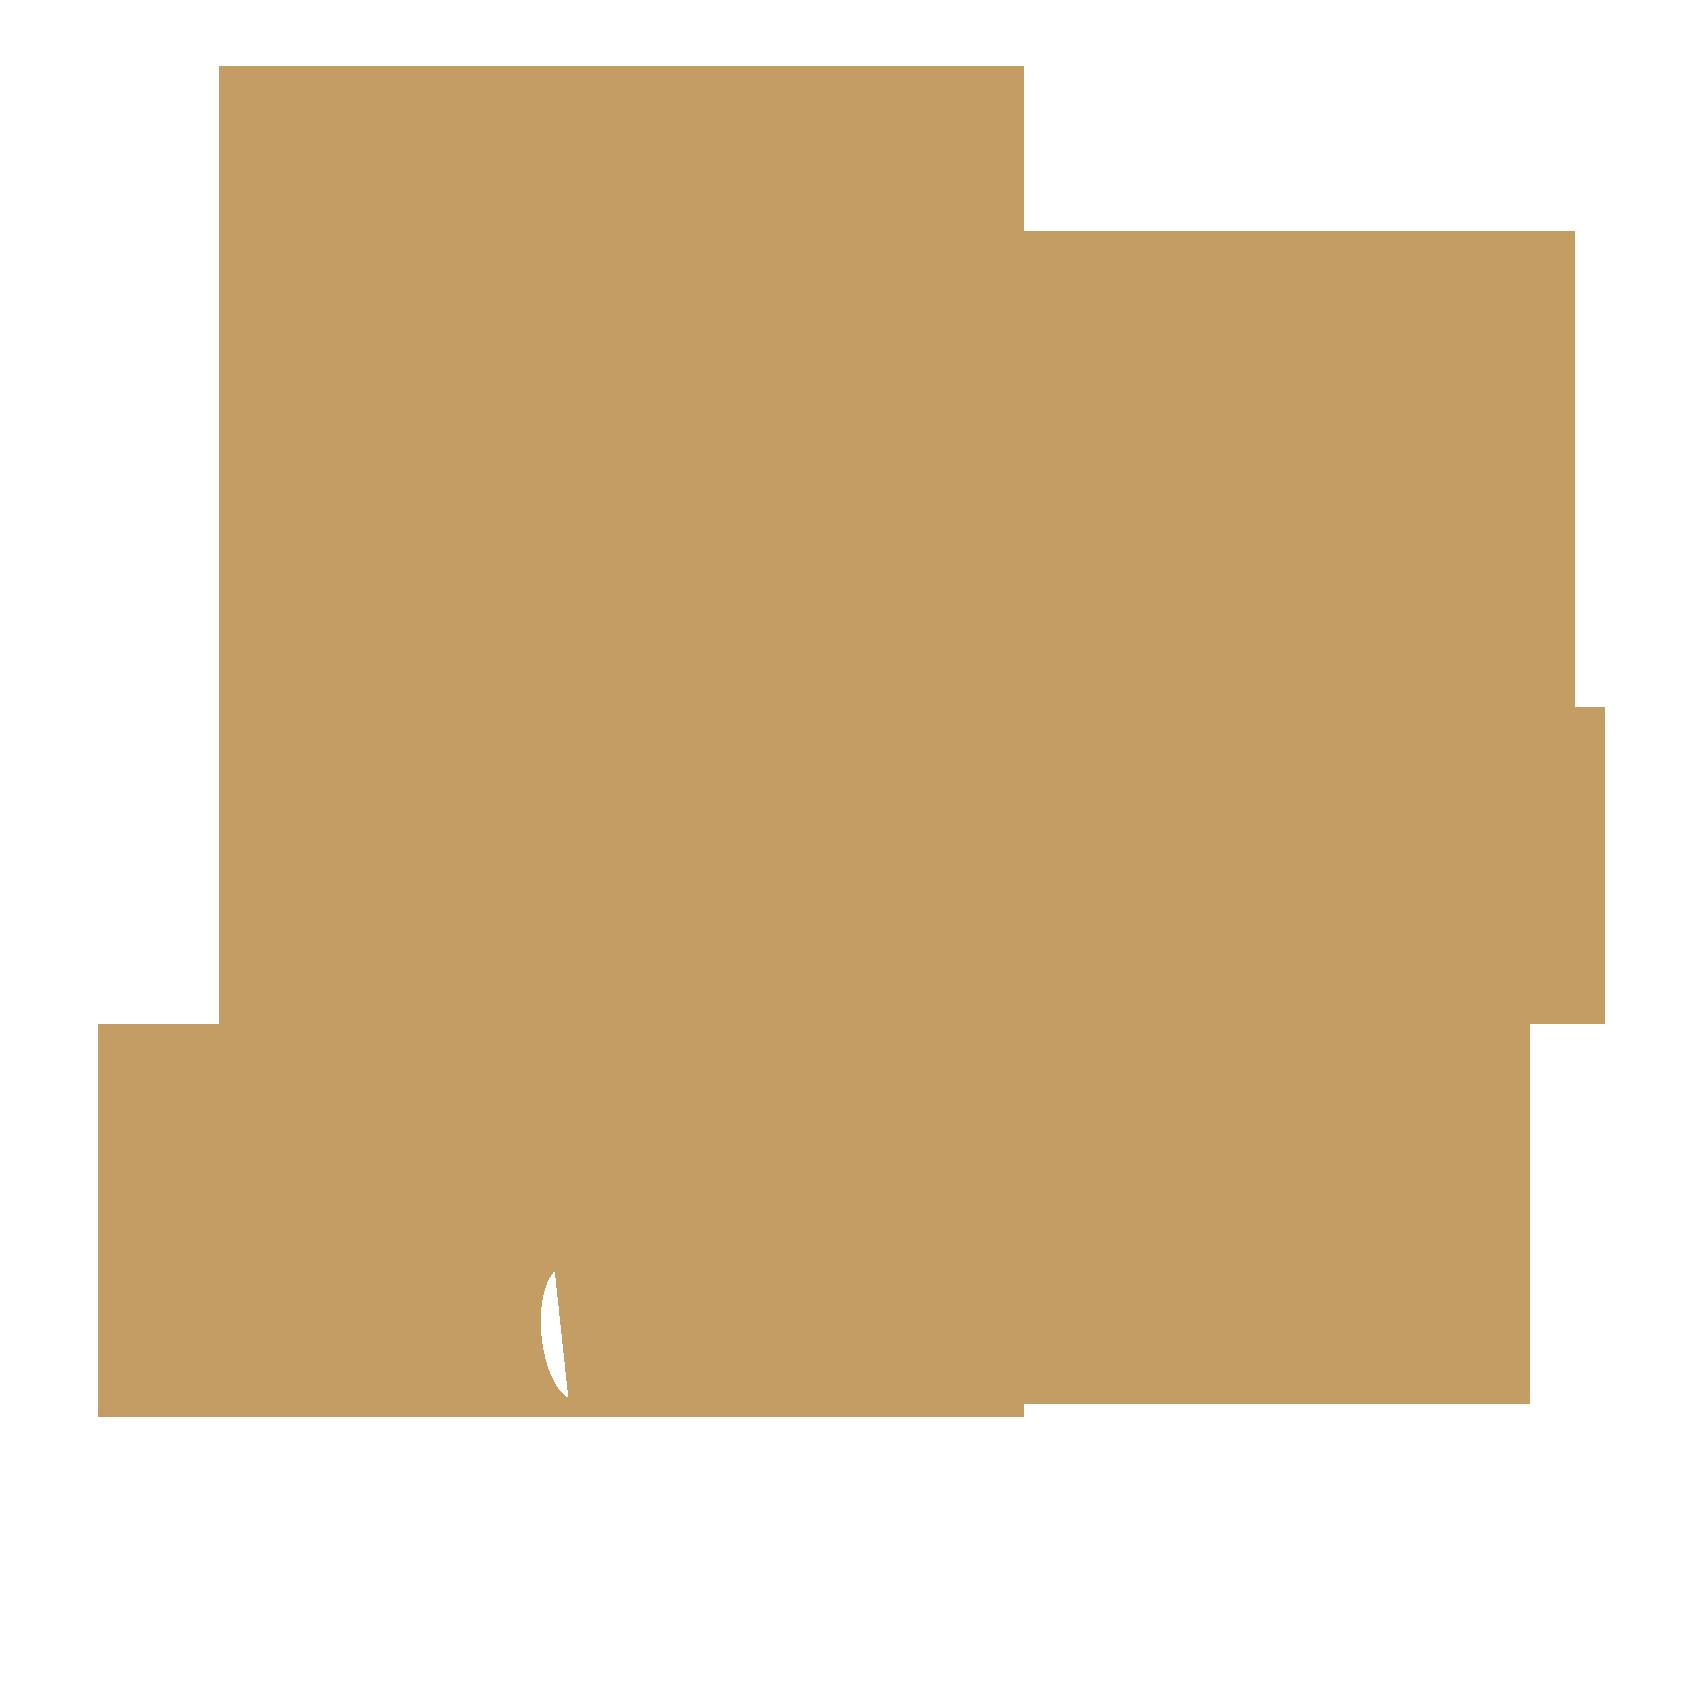 Alharam Hall, Restaurant and Cafe